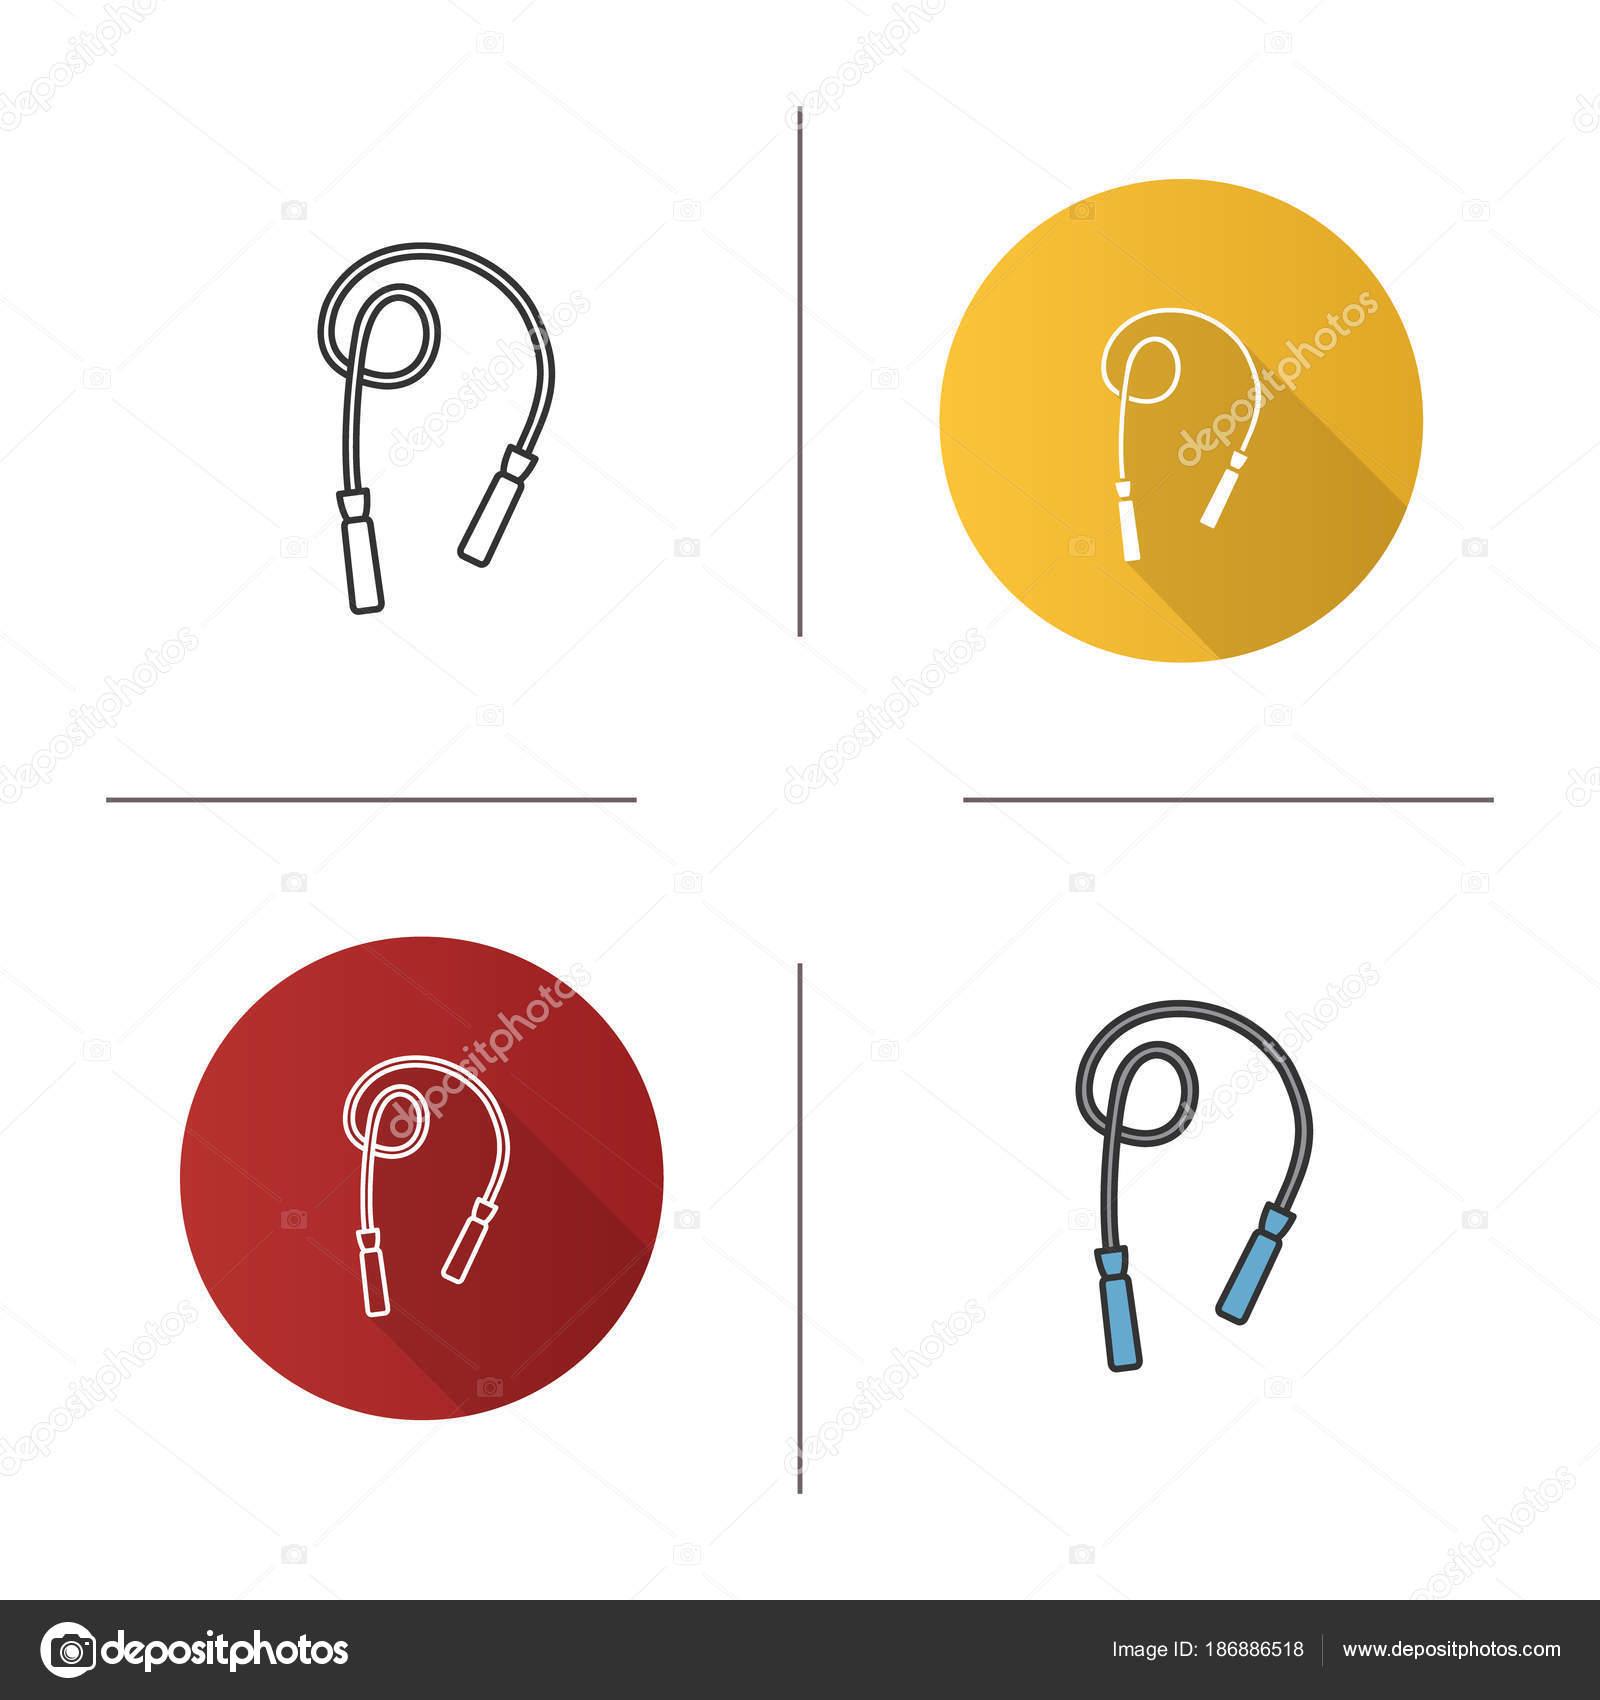 depositphotos_186886518 stock illustration jump rope icon flat design jump rope icon flat design linear color styles skipping rope stock